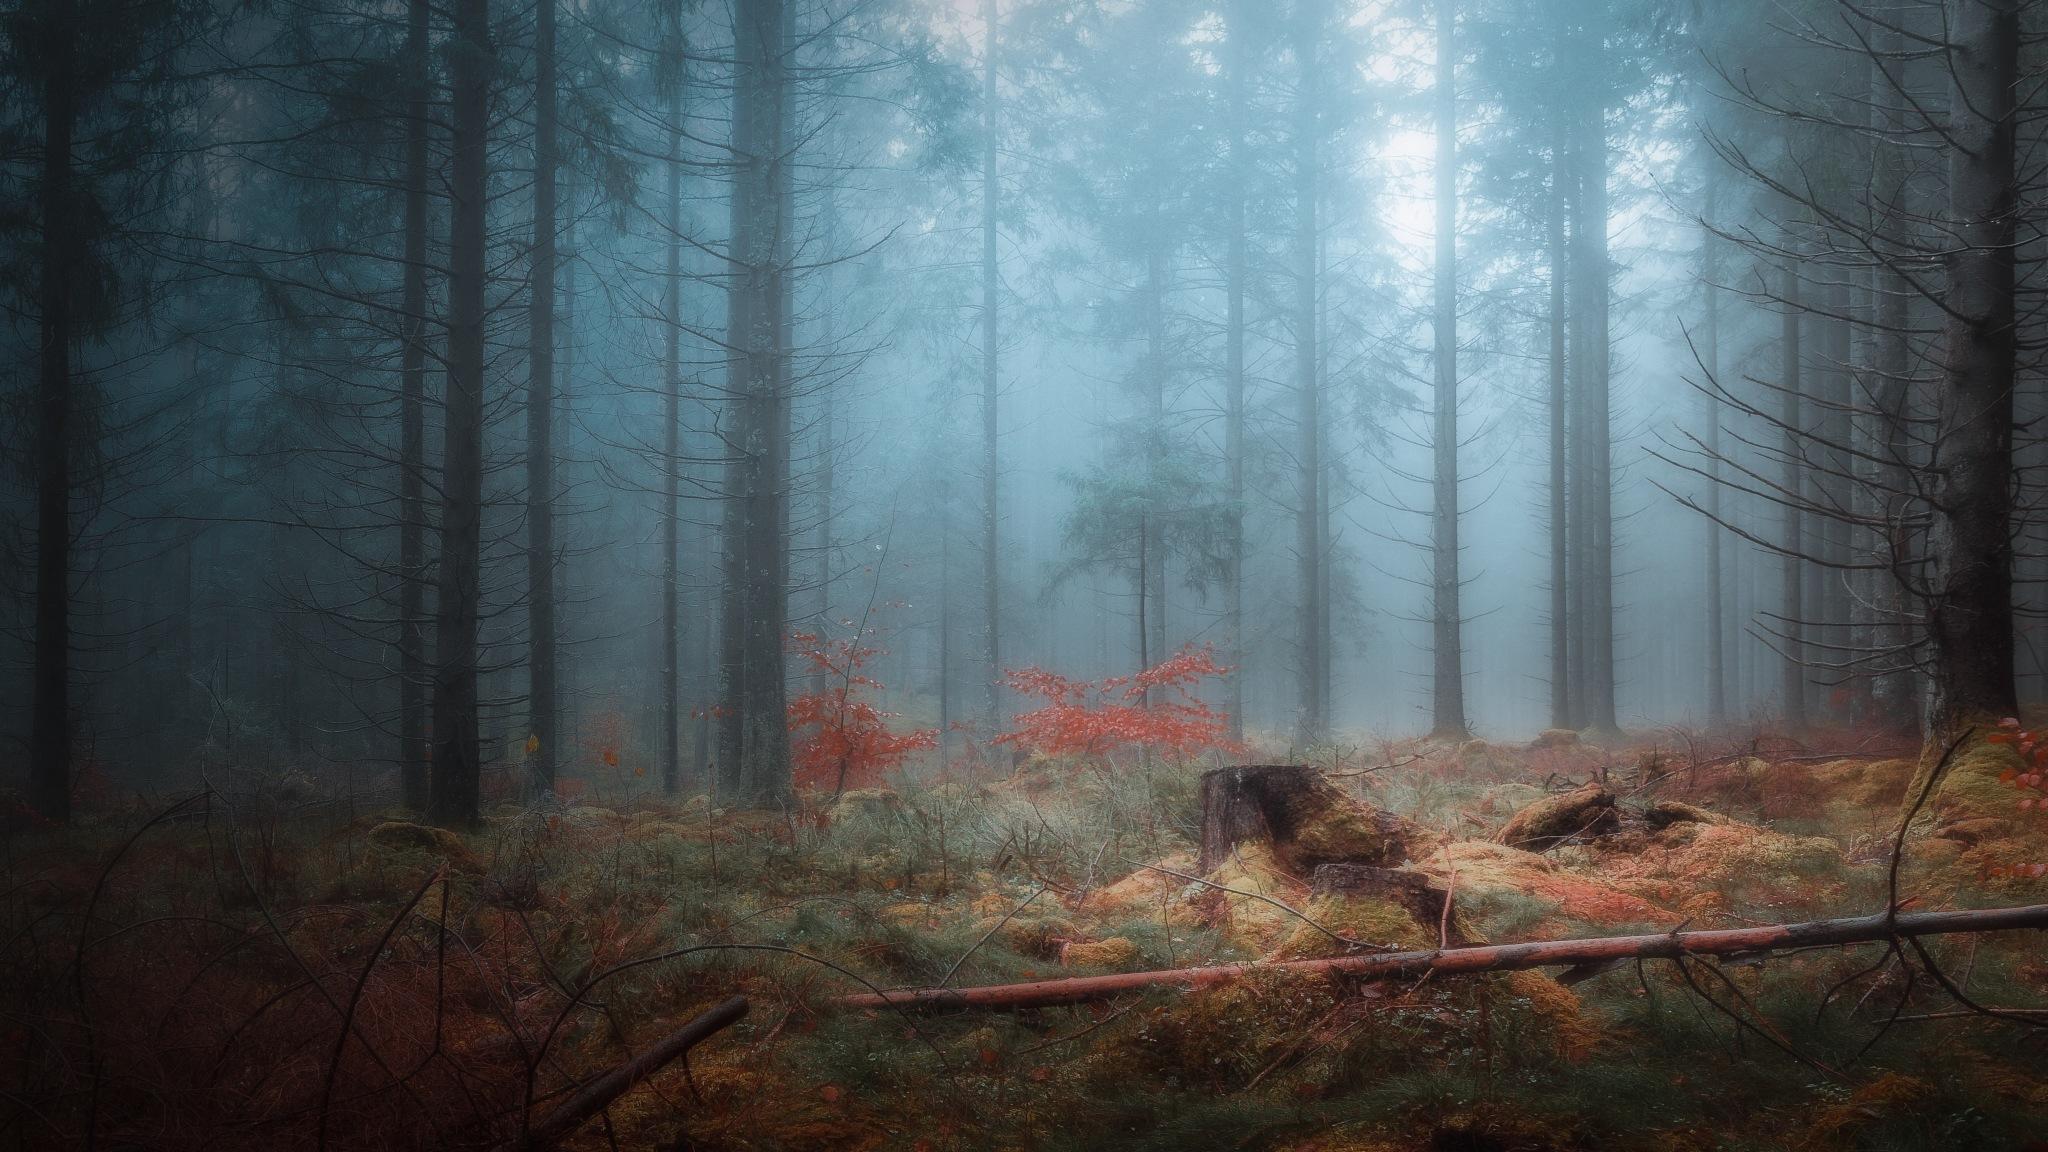 The Glade by Göran Ebenhart